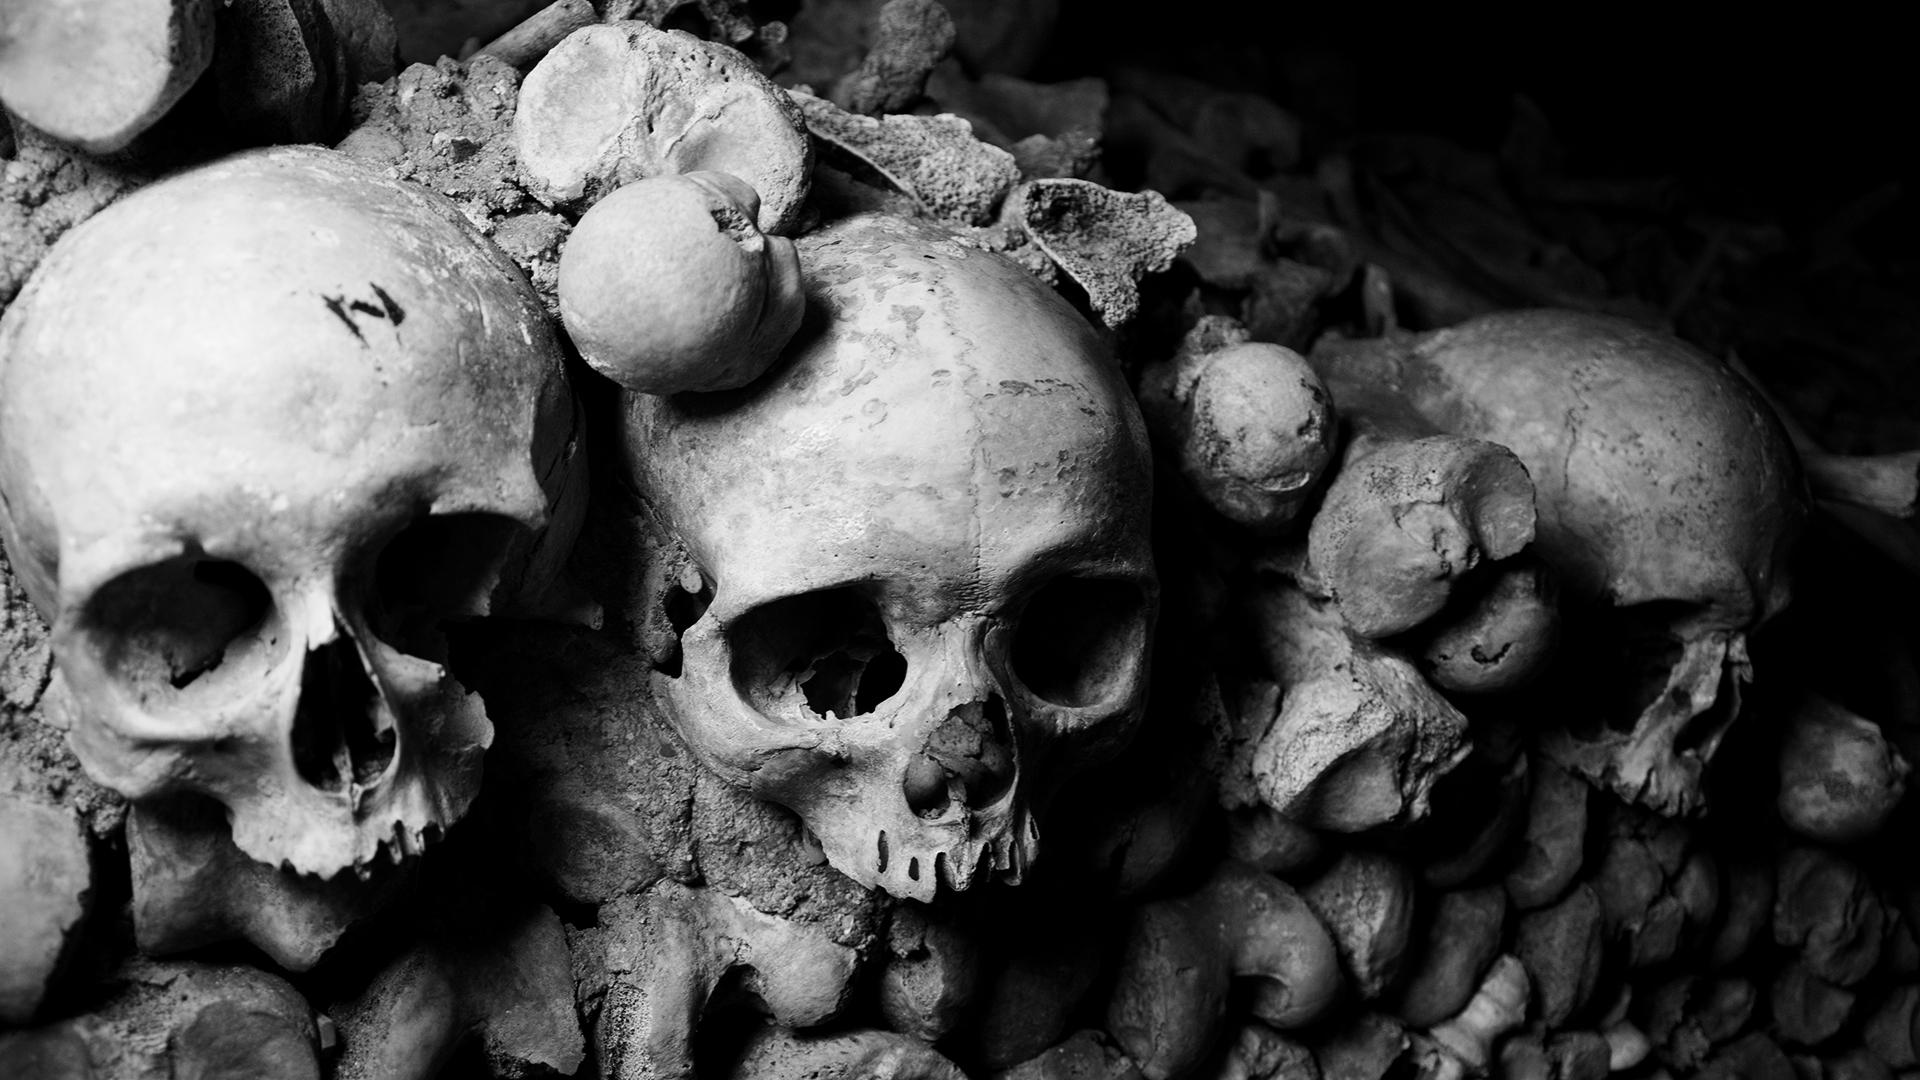 skulls_by_dxd-d8mvtpq